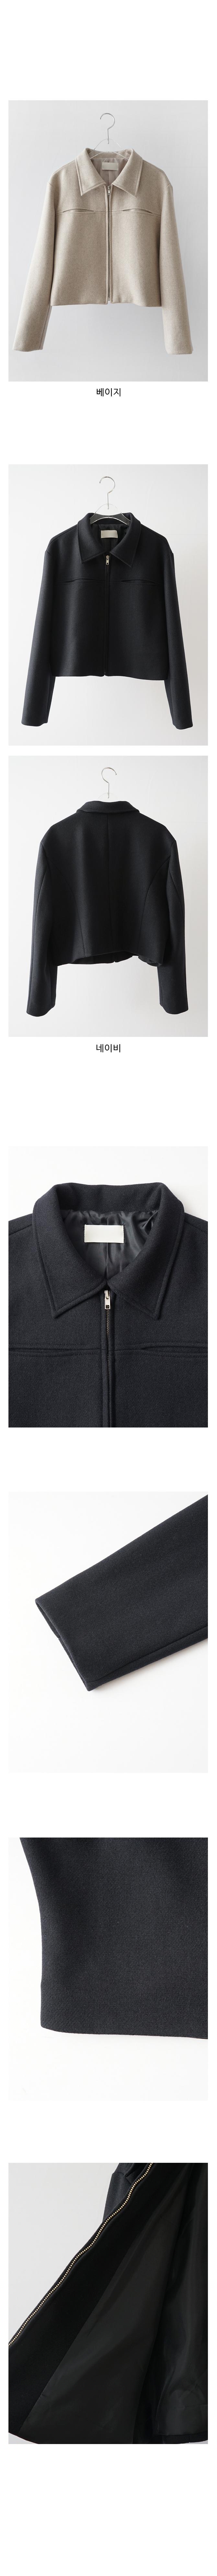 wool combine semi crop jacket